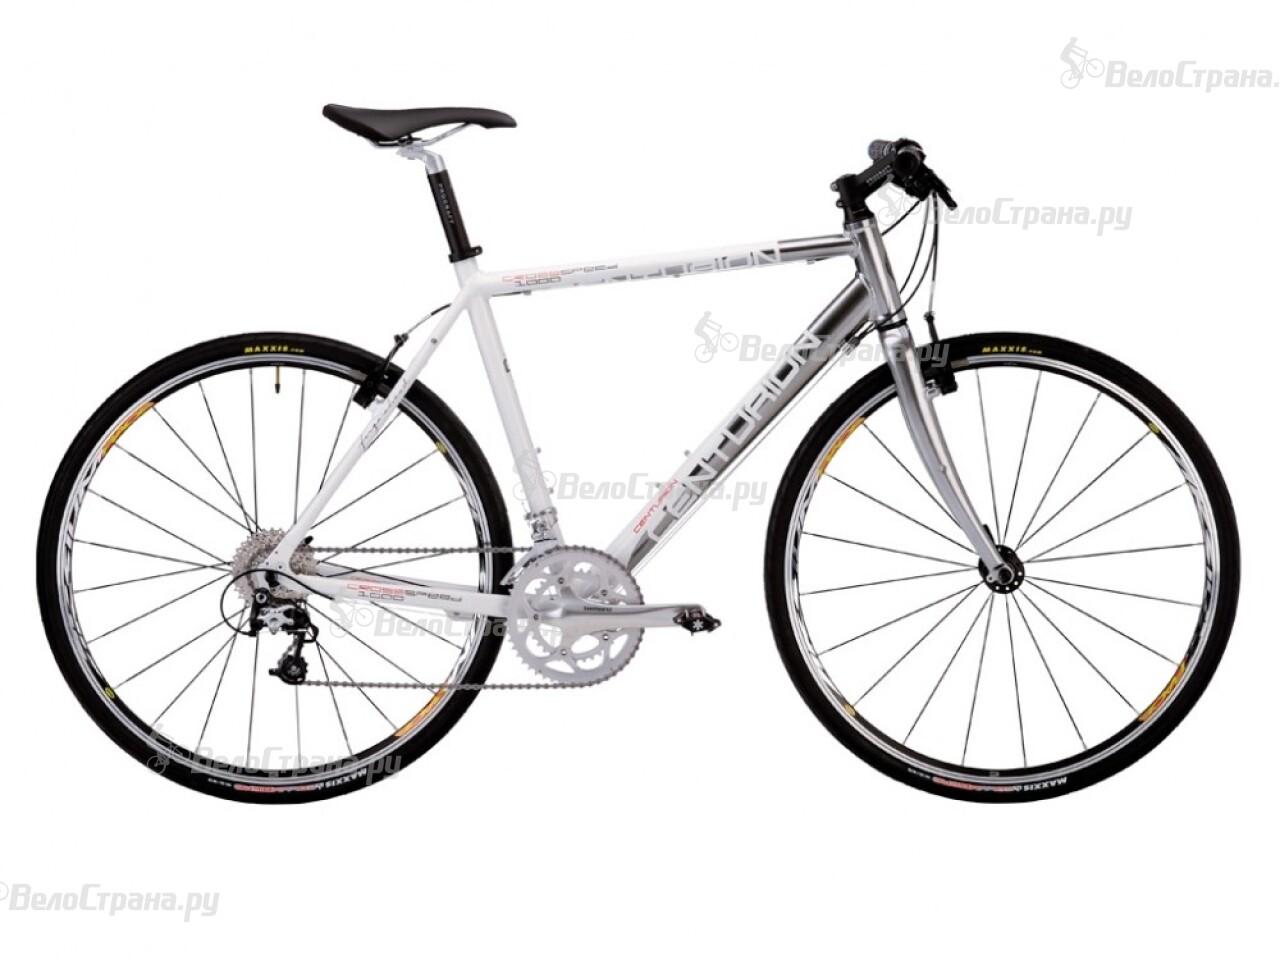 Велосипед Centurion Cross speed 1000 (2013) велосипед centurion cross 6 md 2013